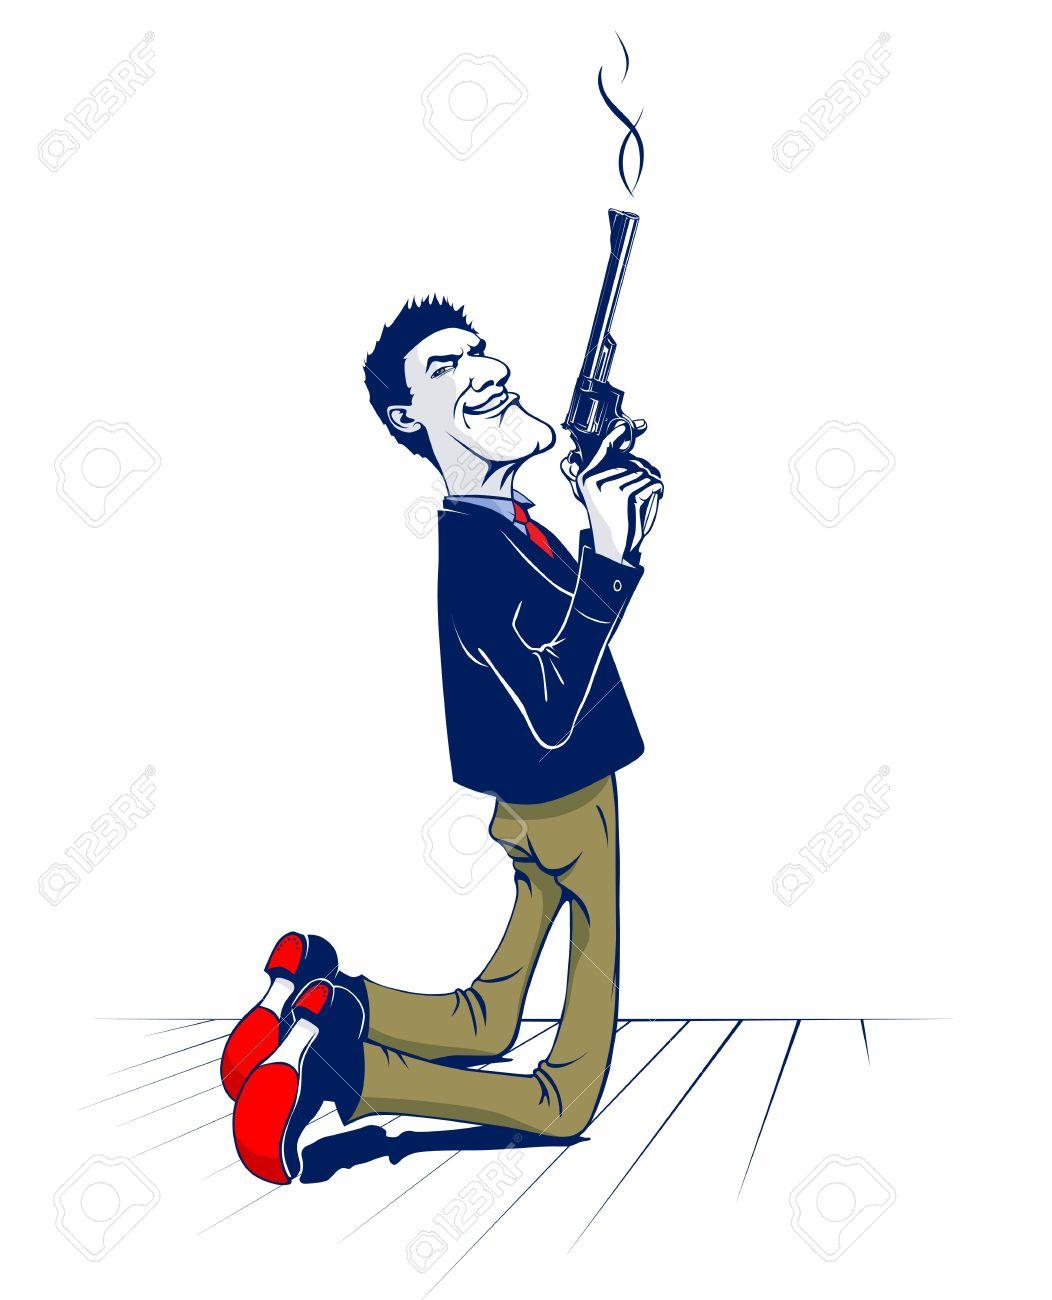 kneel gun gangster with smoking gun Stock Vector - 10991422